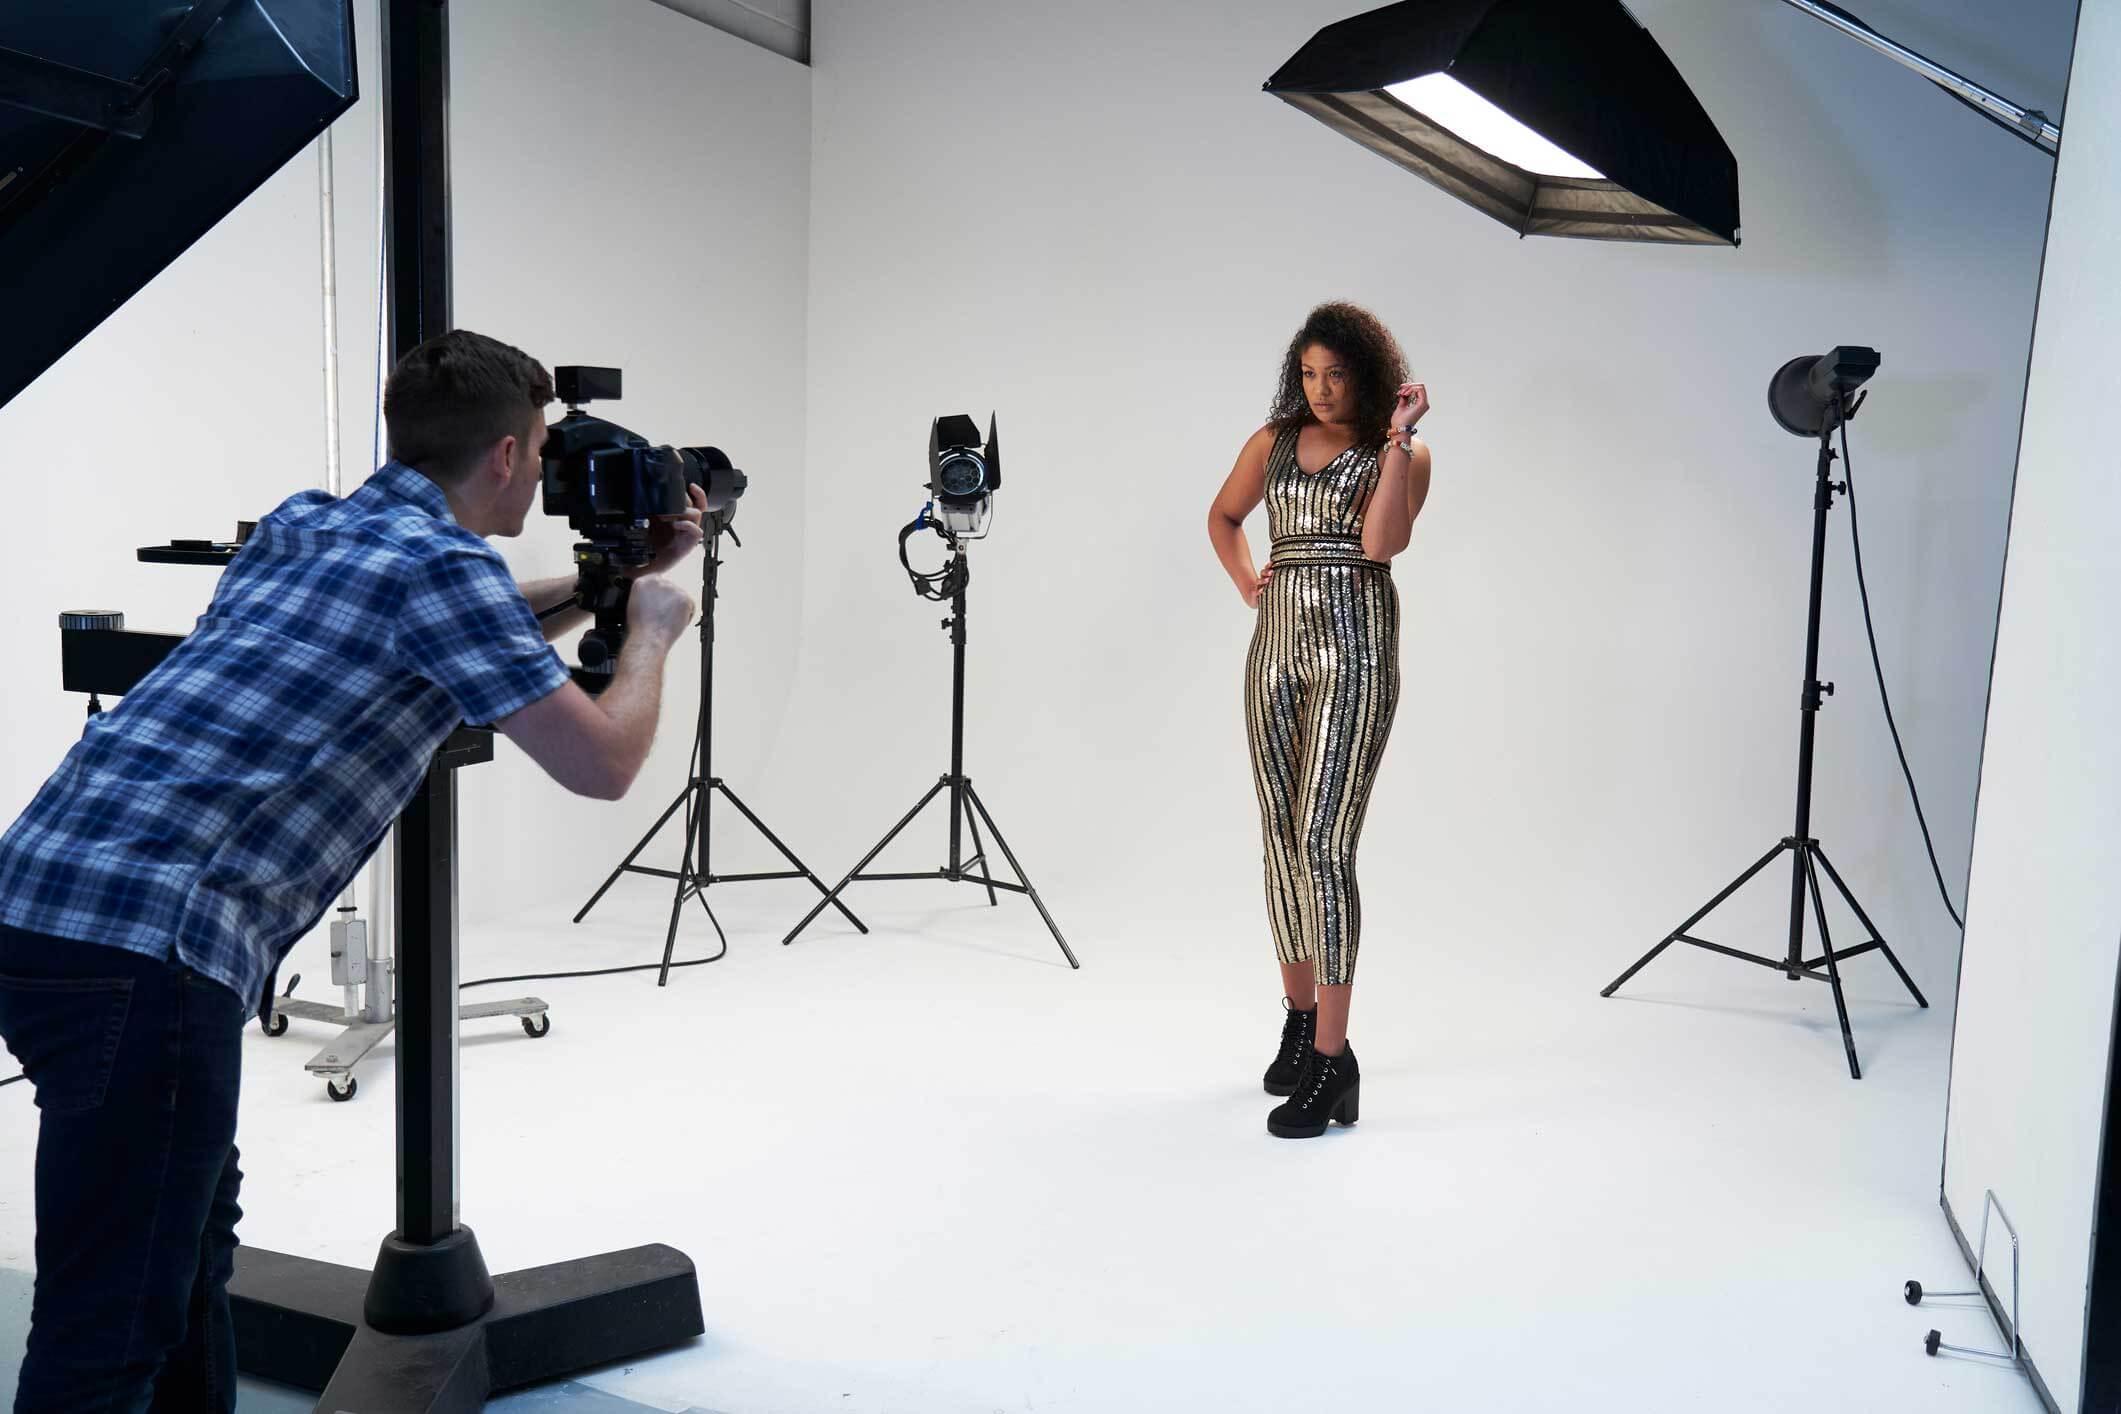 fashion-phootgraphy-Camera-and-equipment Fashion Photography Tips For Shooting & Editing Photography Tips